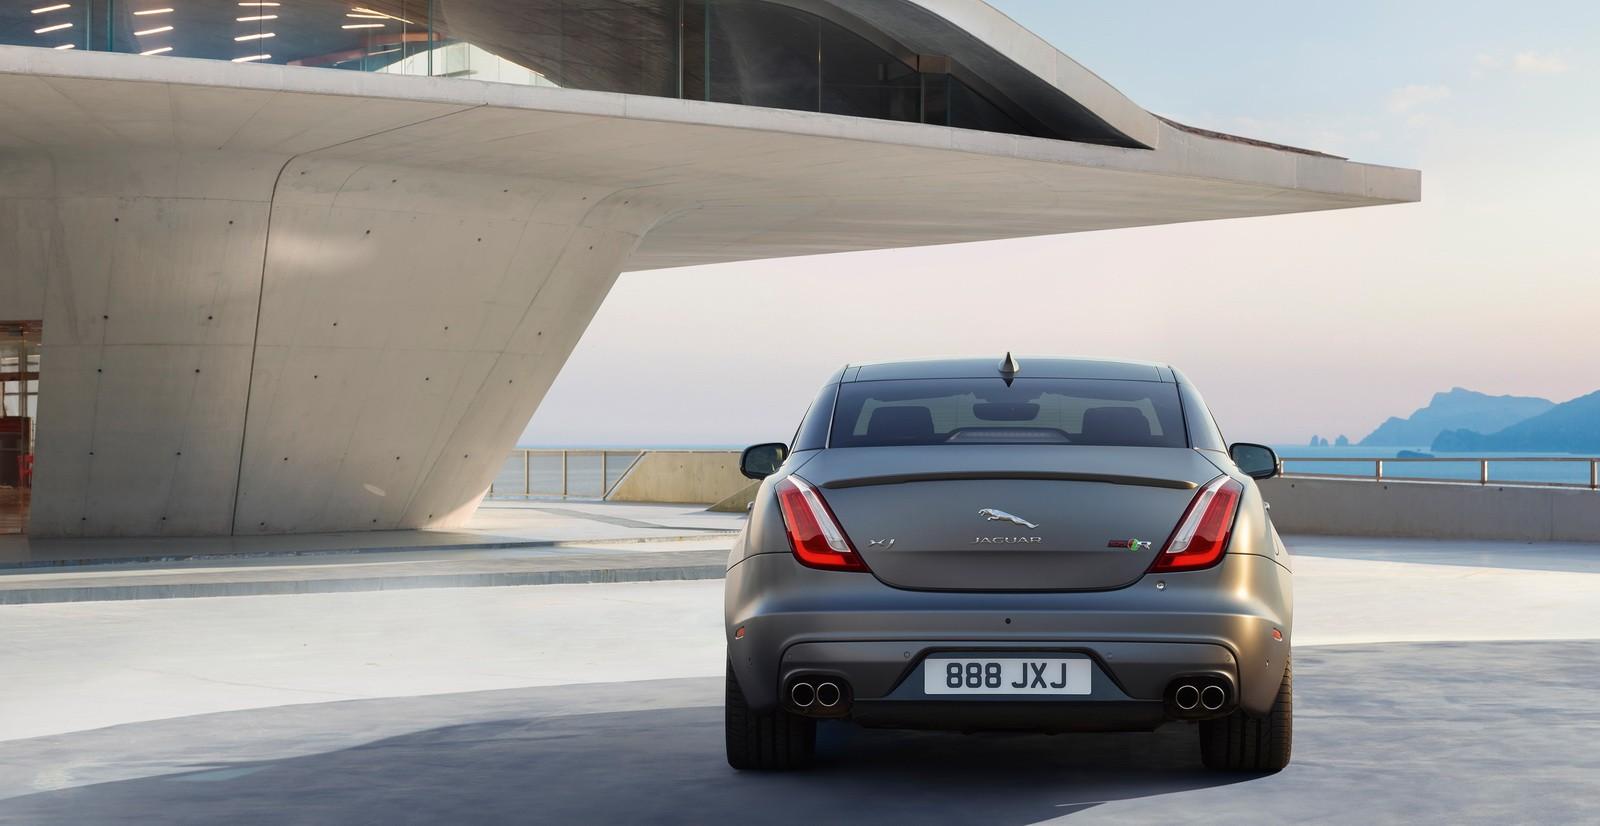 Jaguar Xj Electric 2020